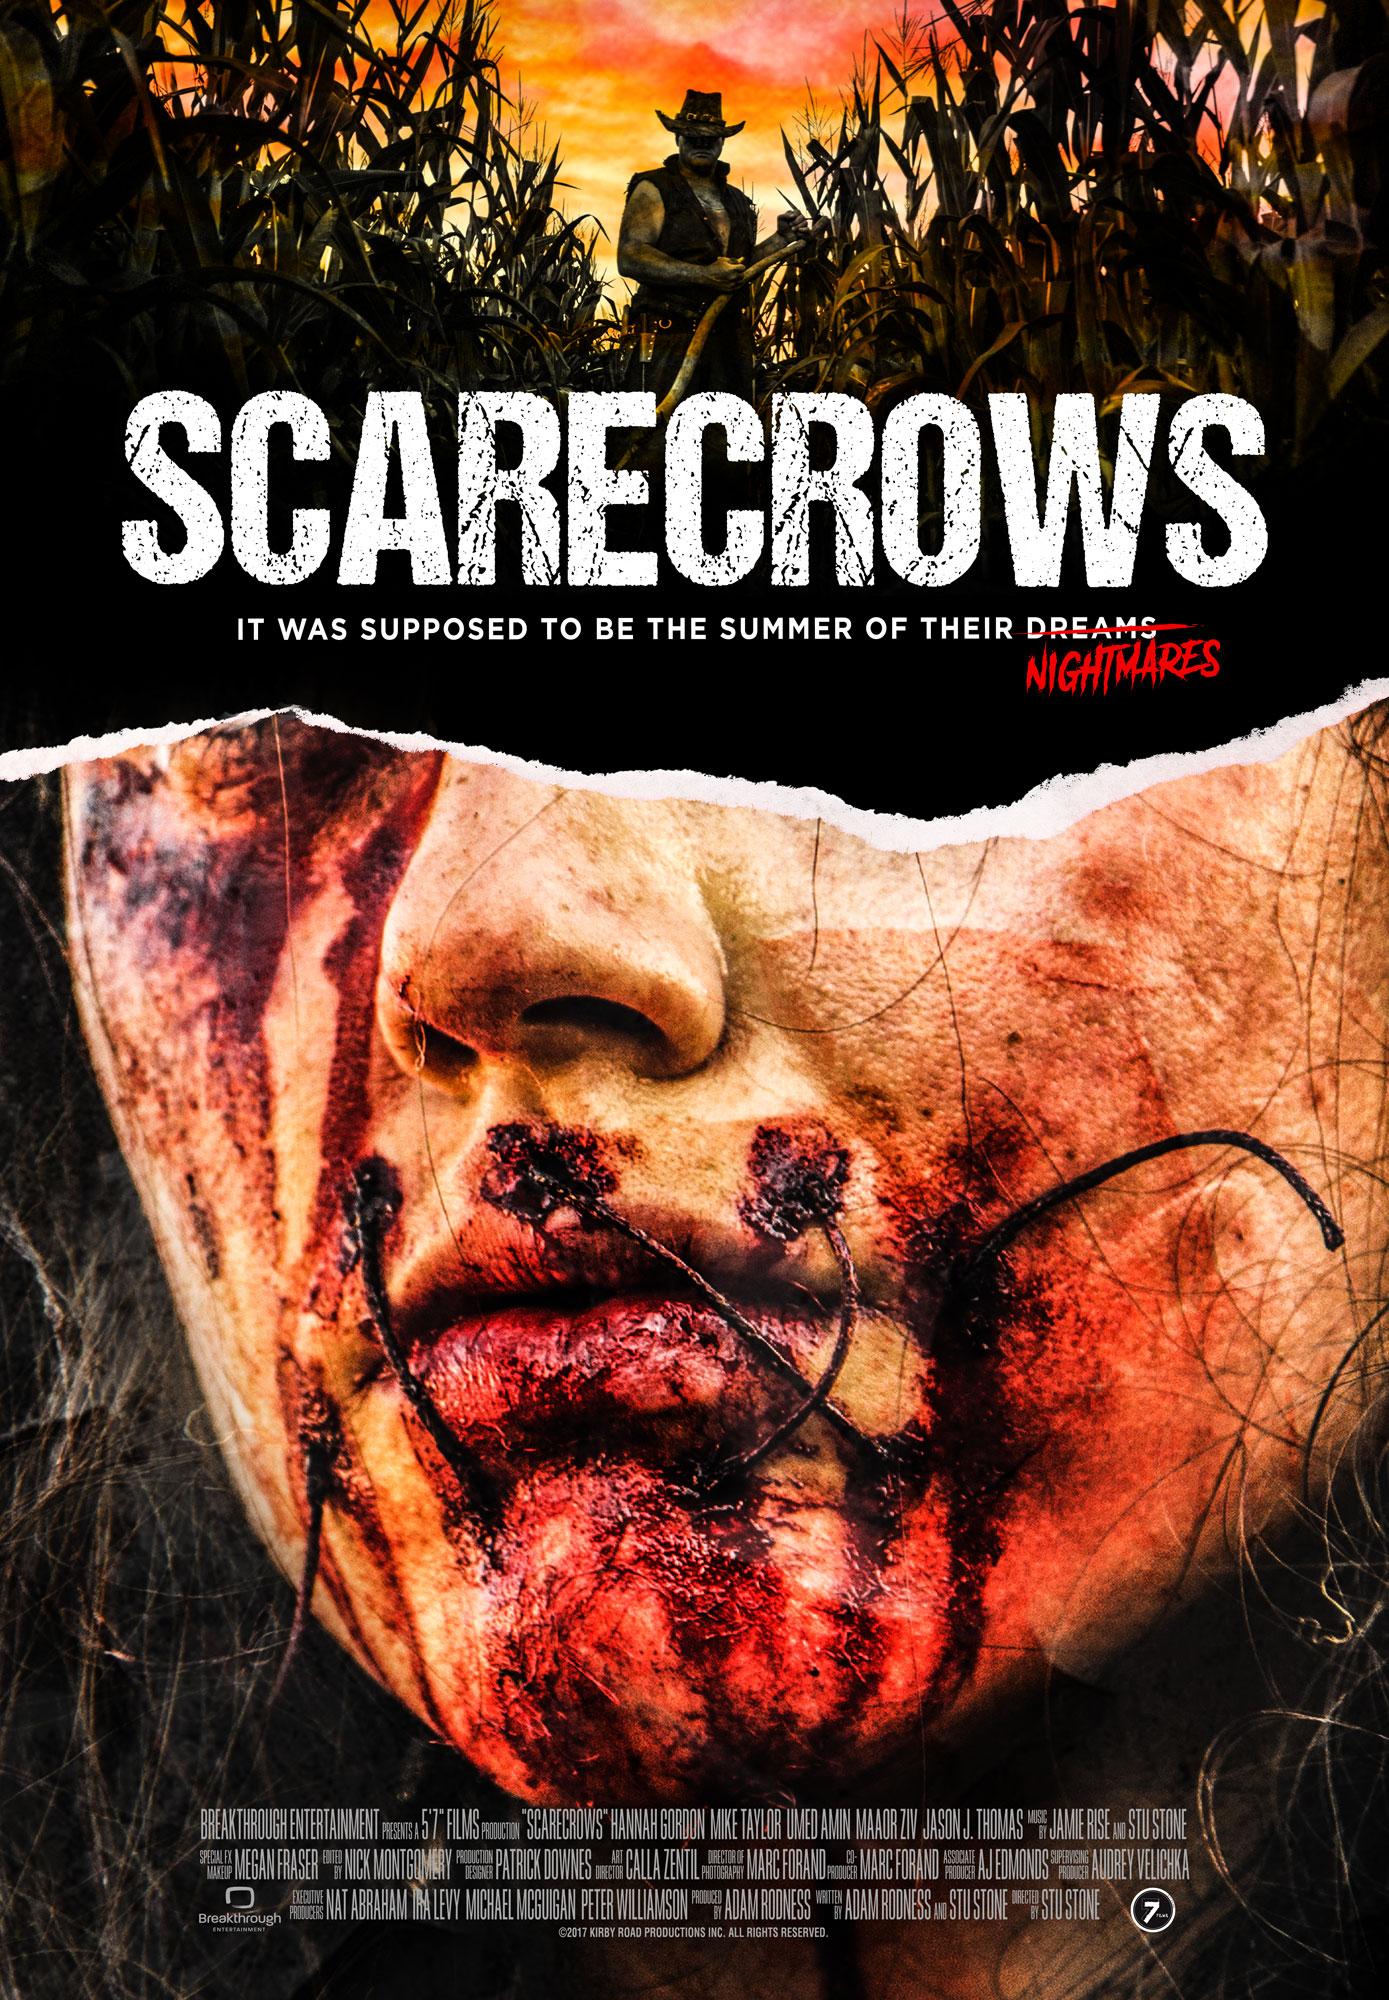 Scarecrows horro movie poster